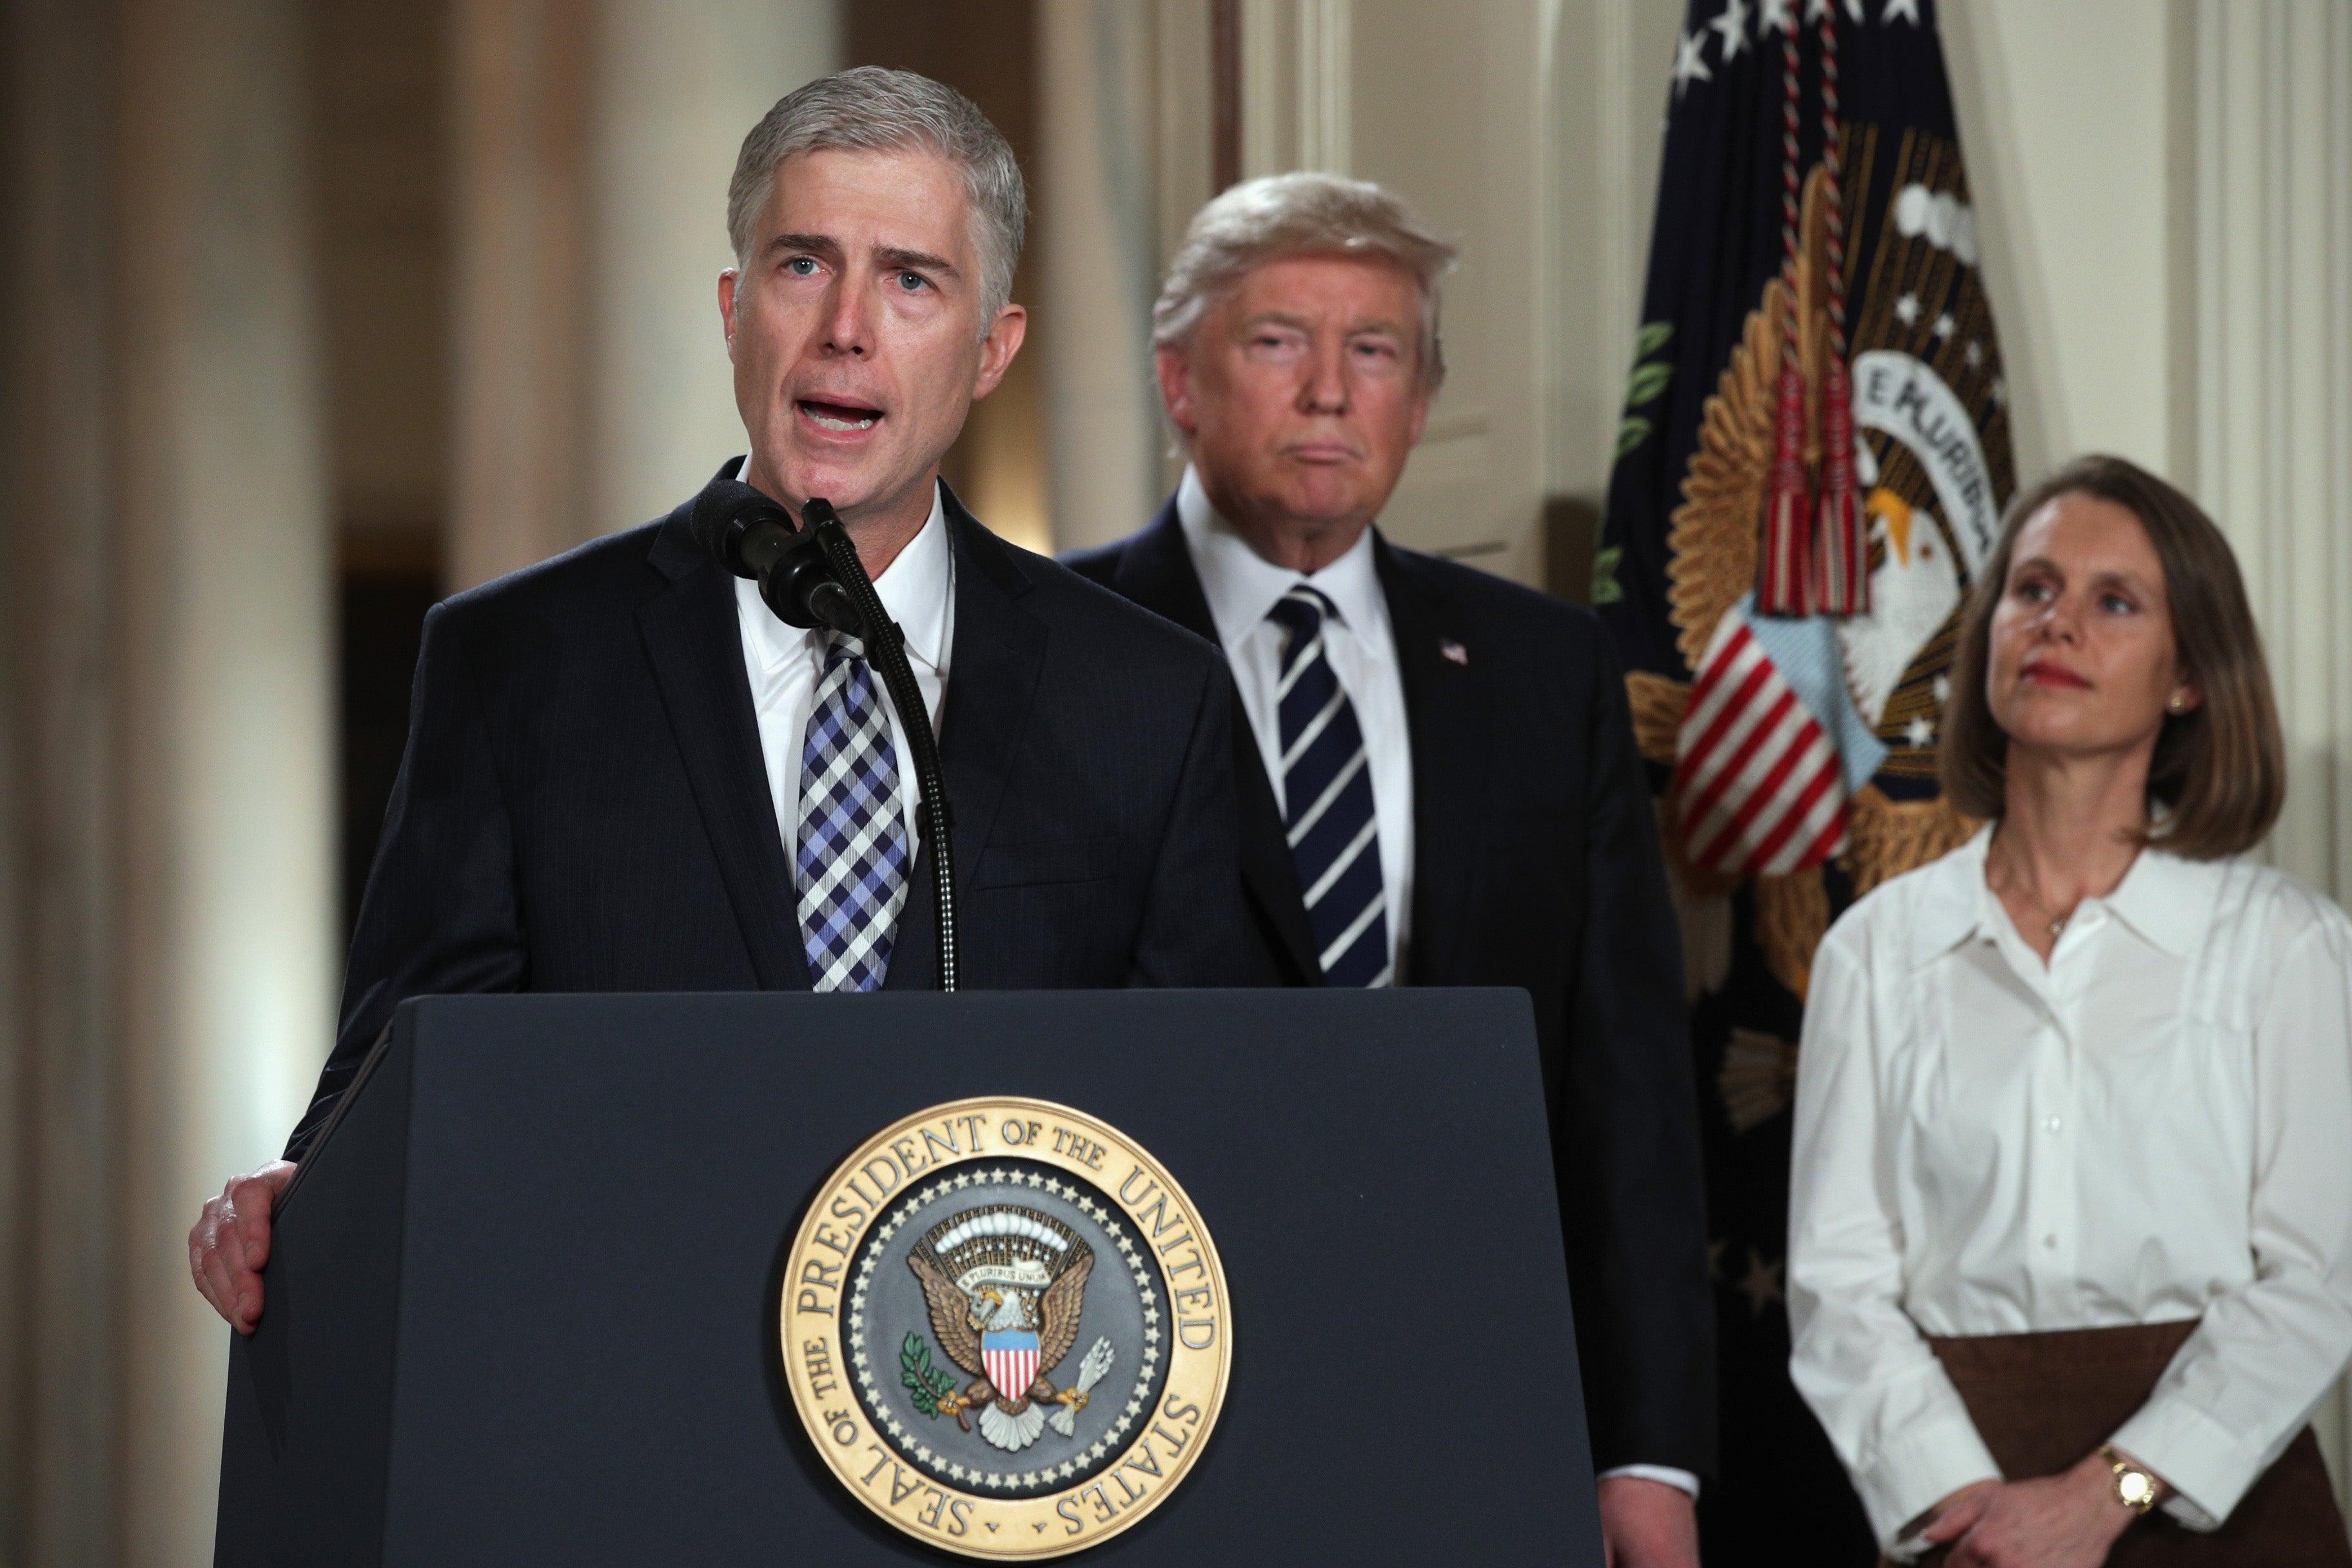 Will Democrats Stop President Trump's Supreme Court Nominee?